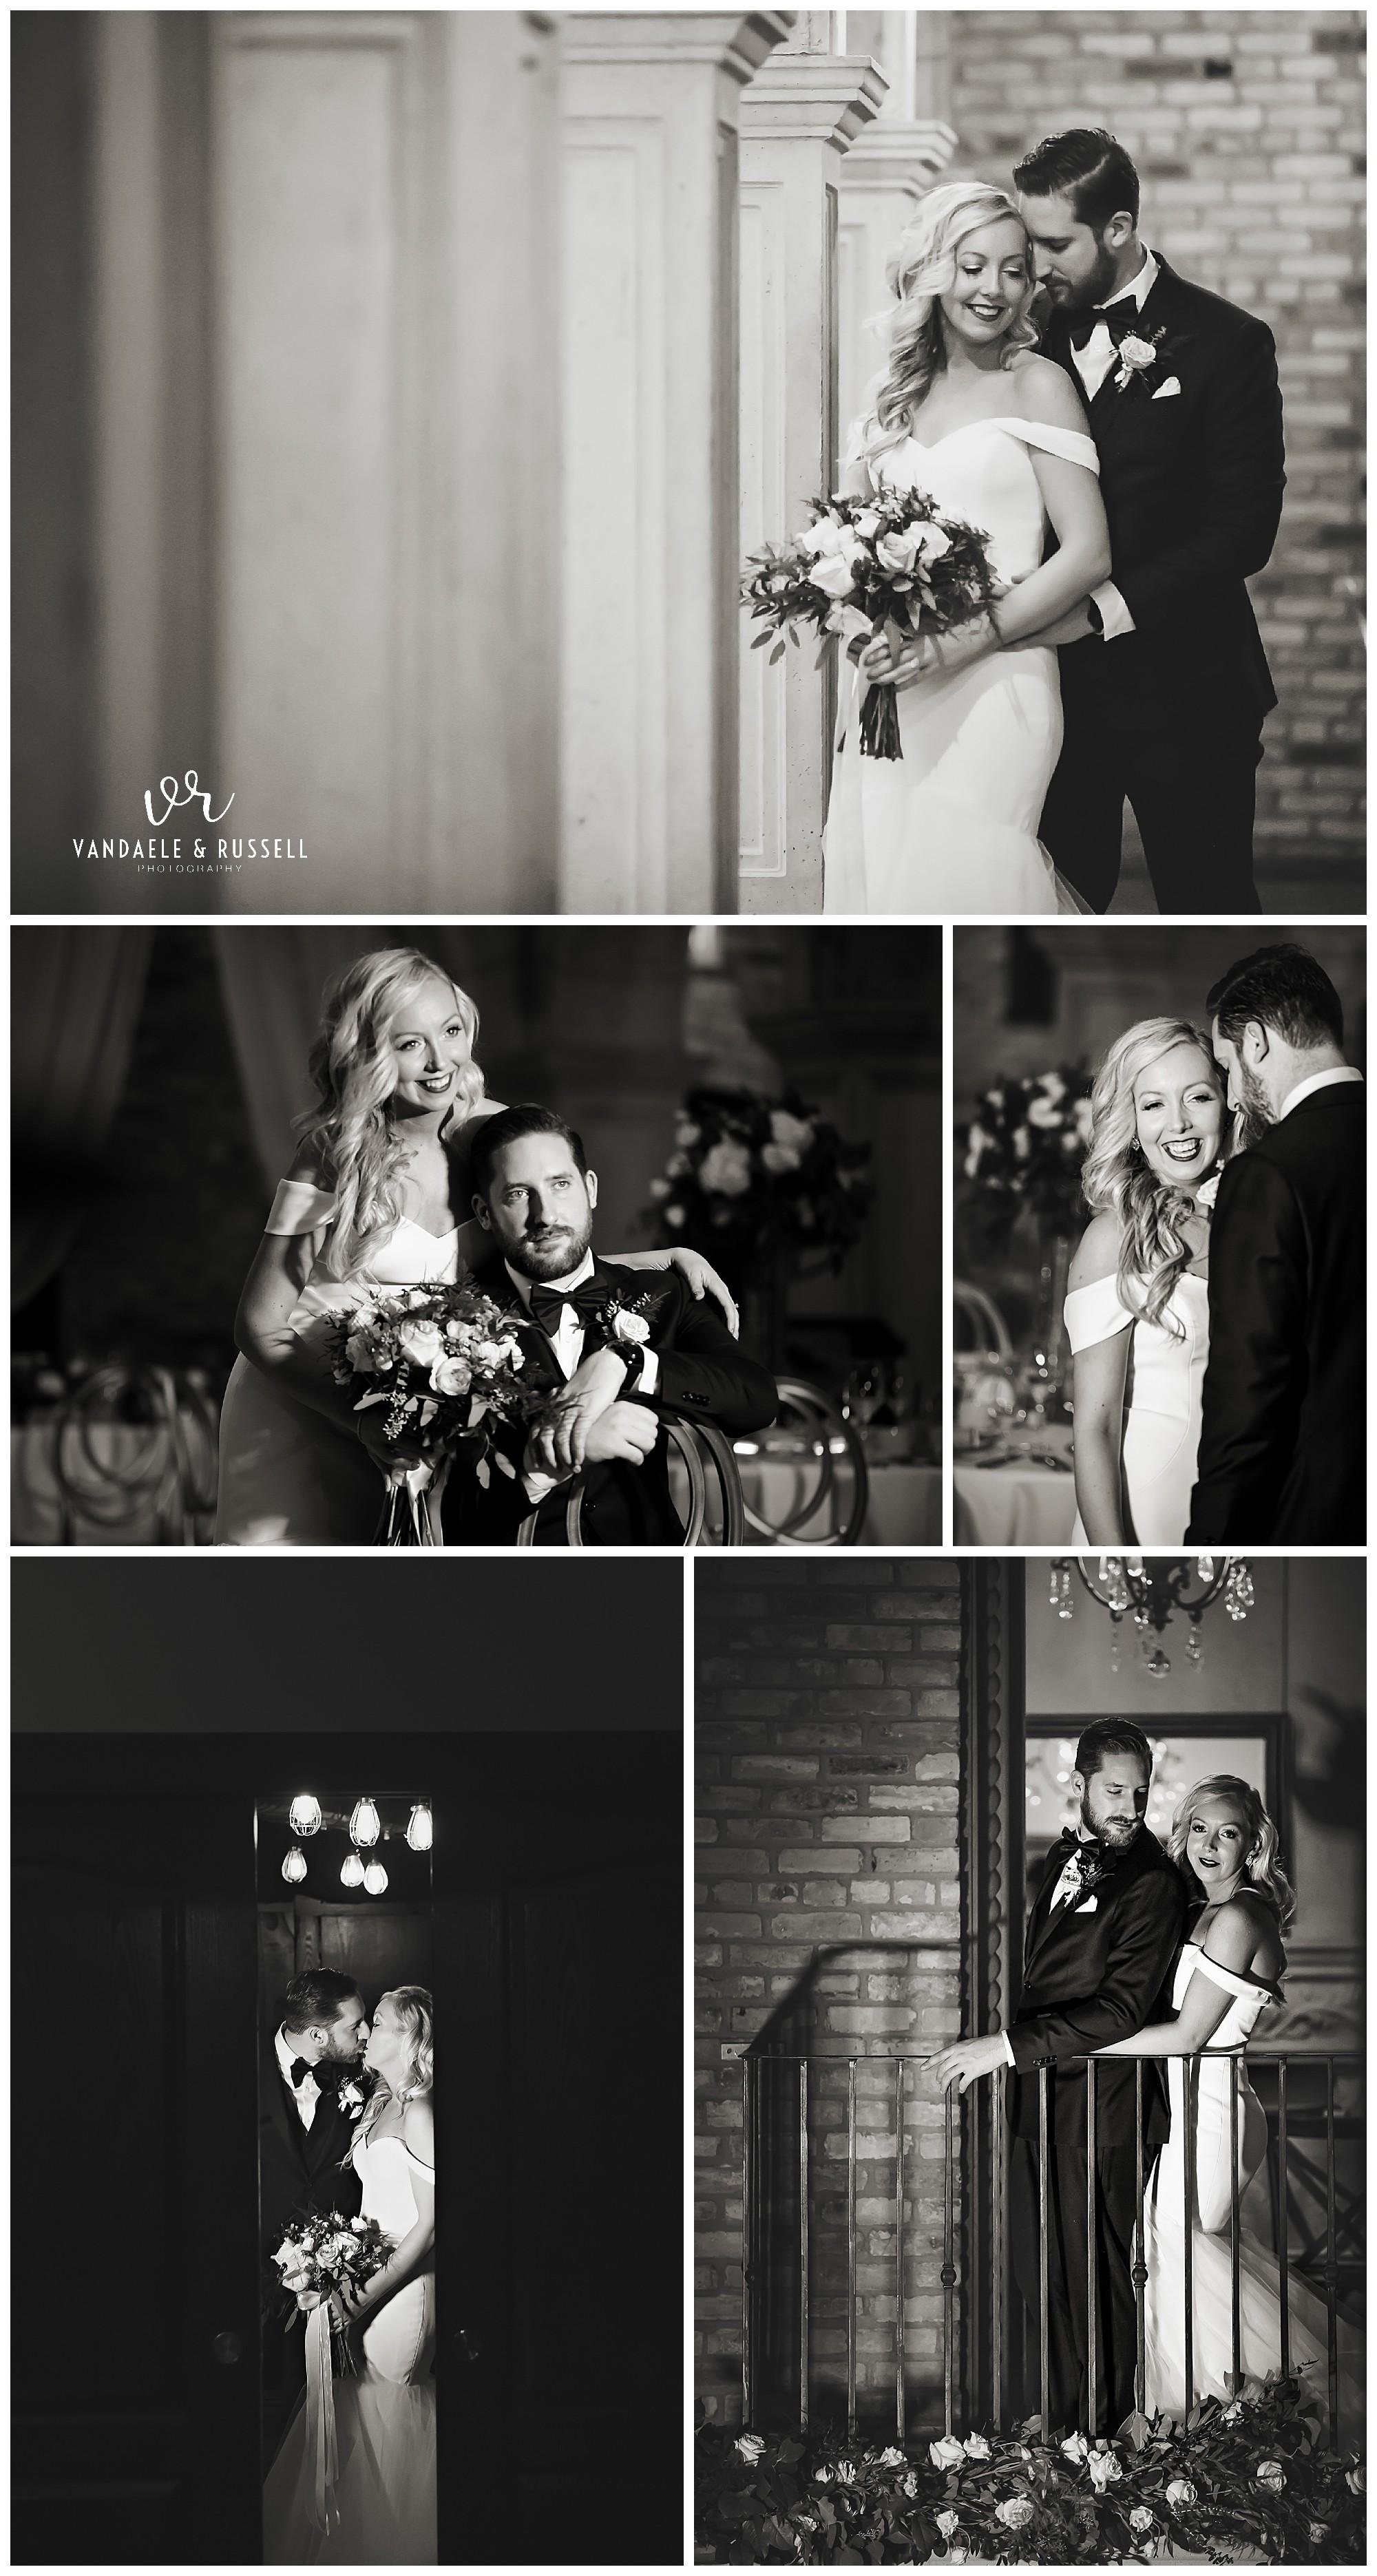 Hacienda-Sarria-Wedding-Photos-NYE-Michelle-Matt-VanDaele-Russell_0016.jpg